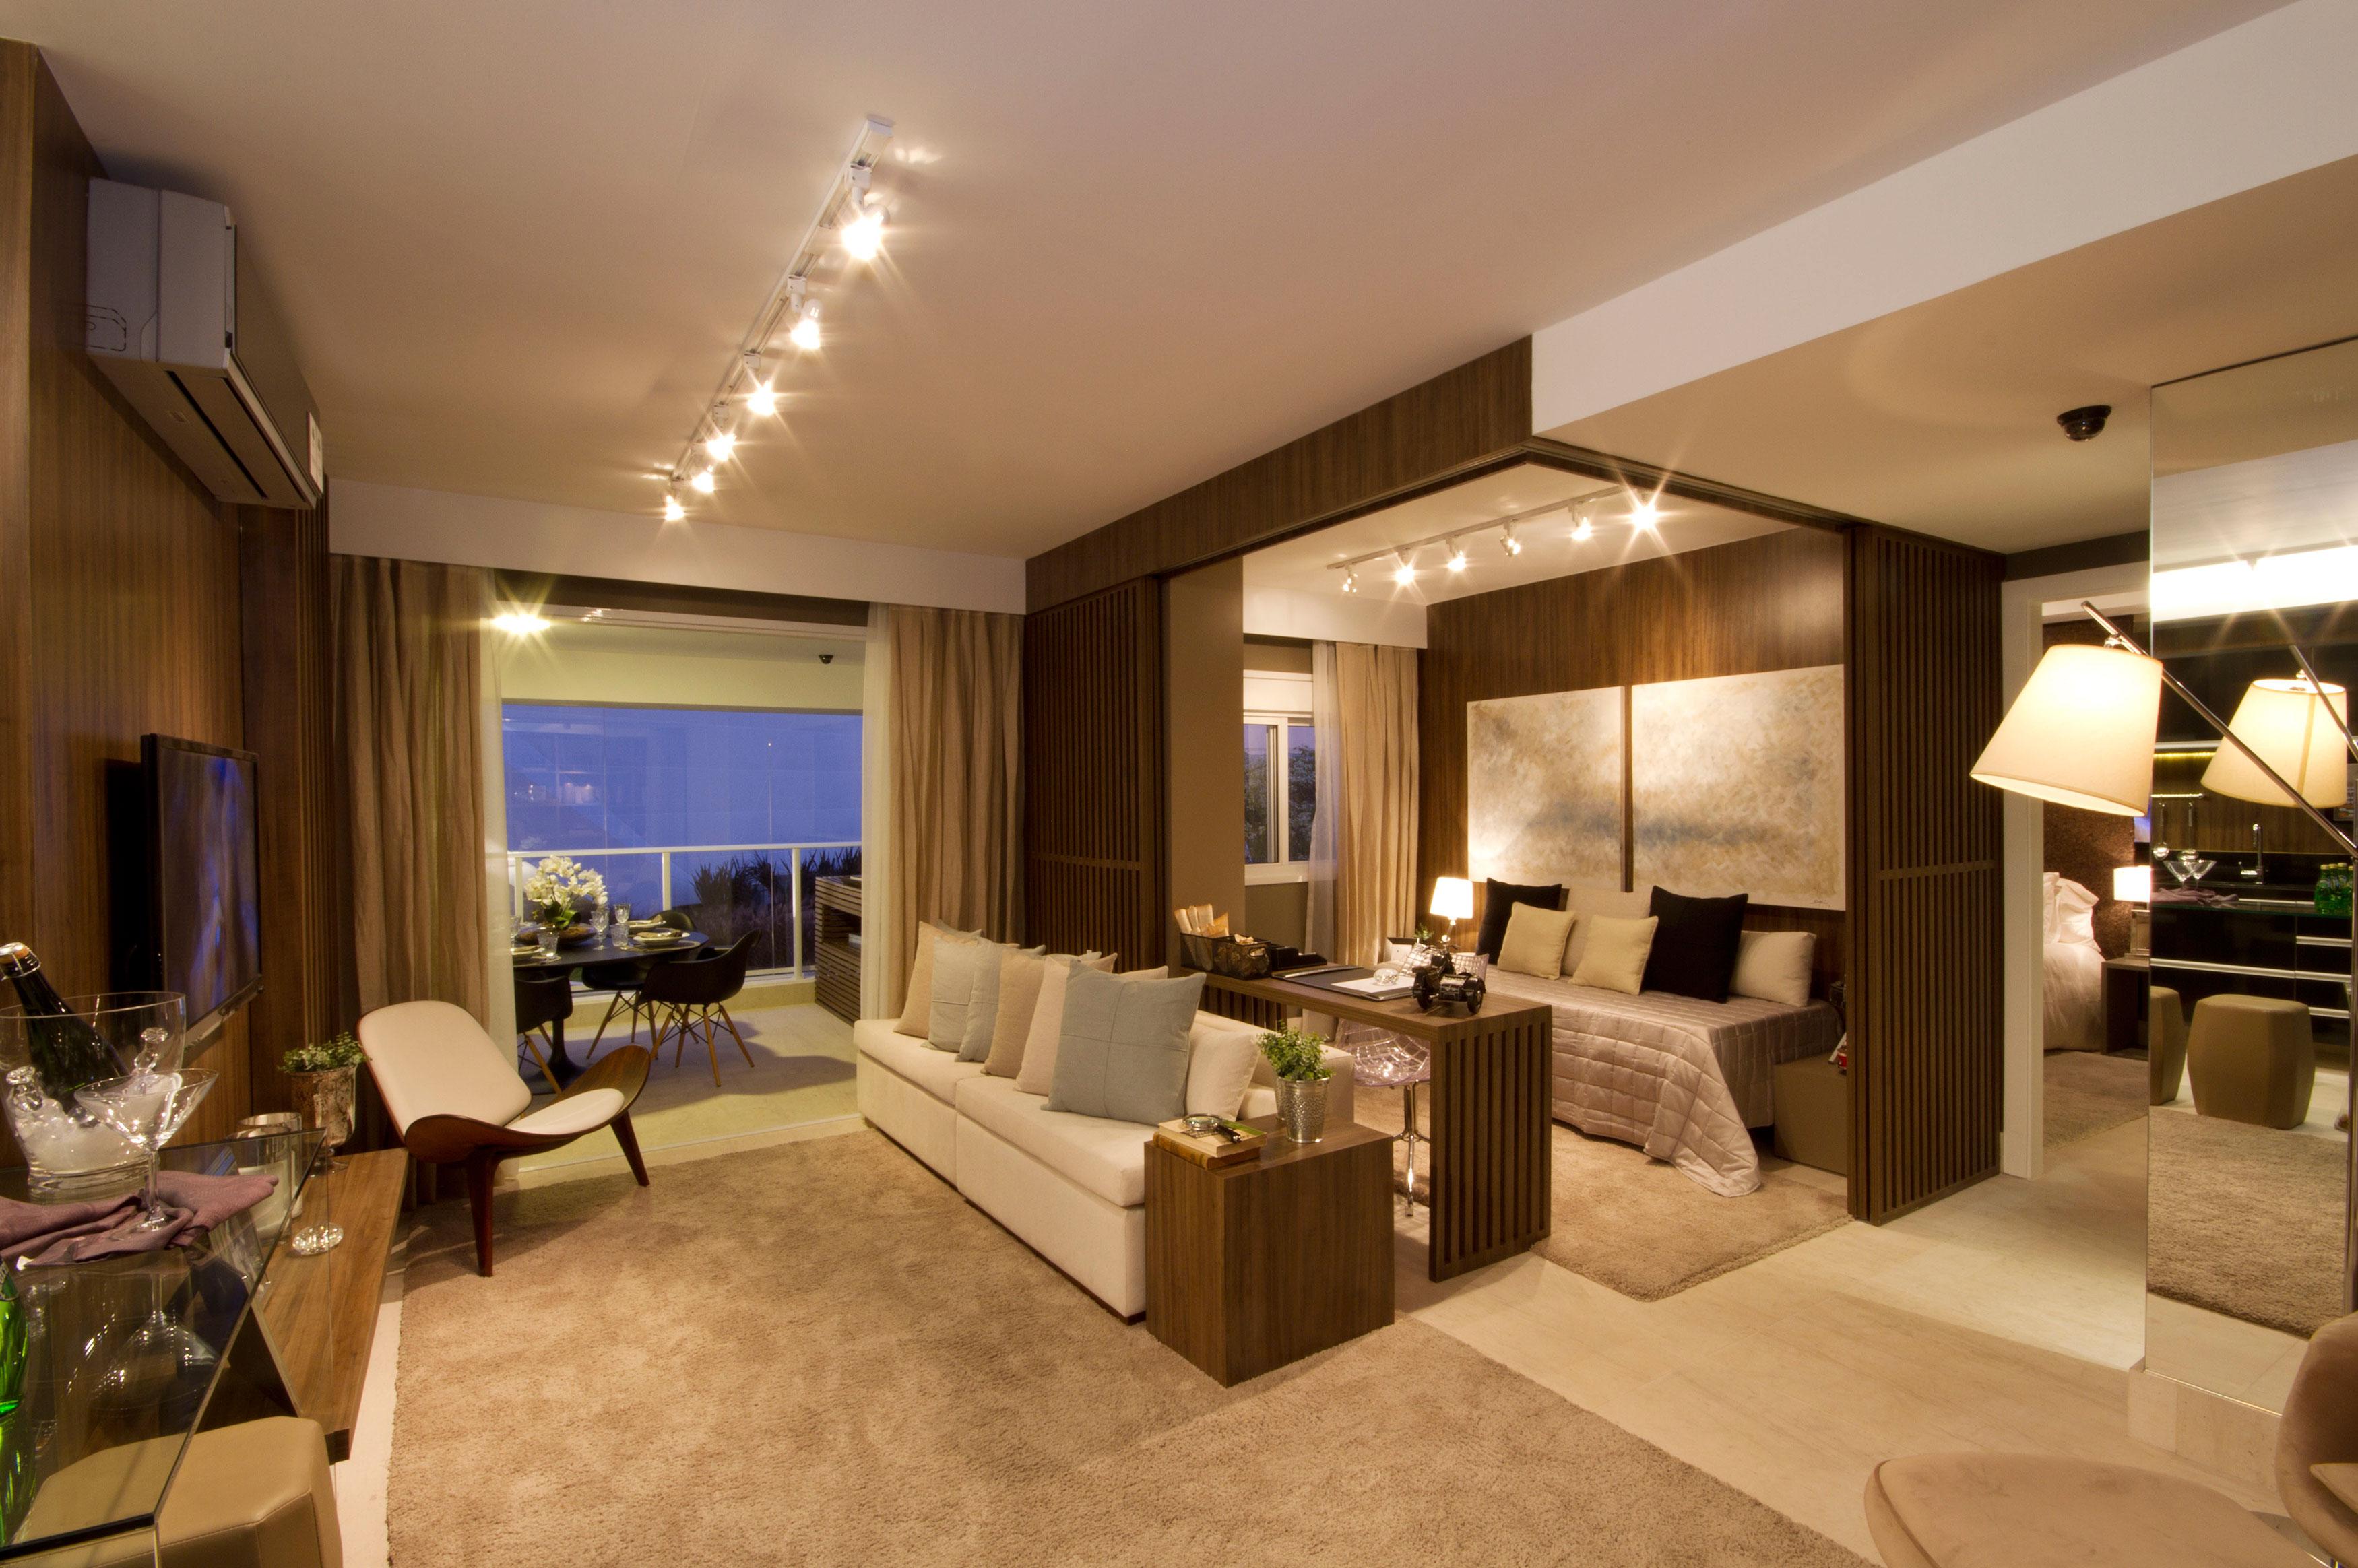 79 m² - Living